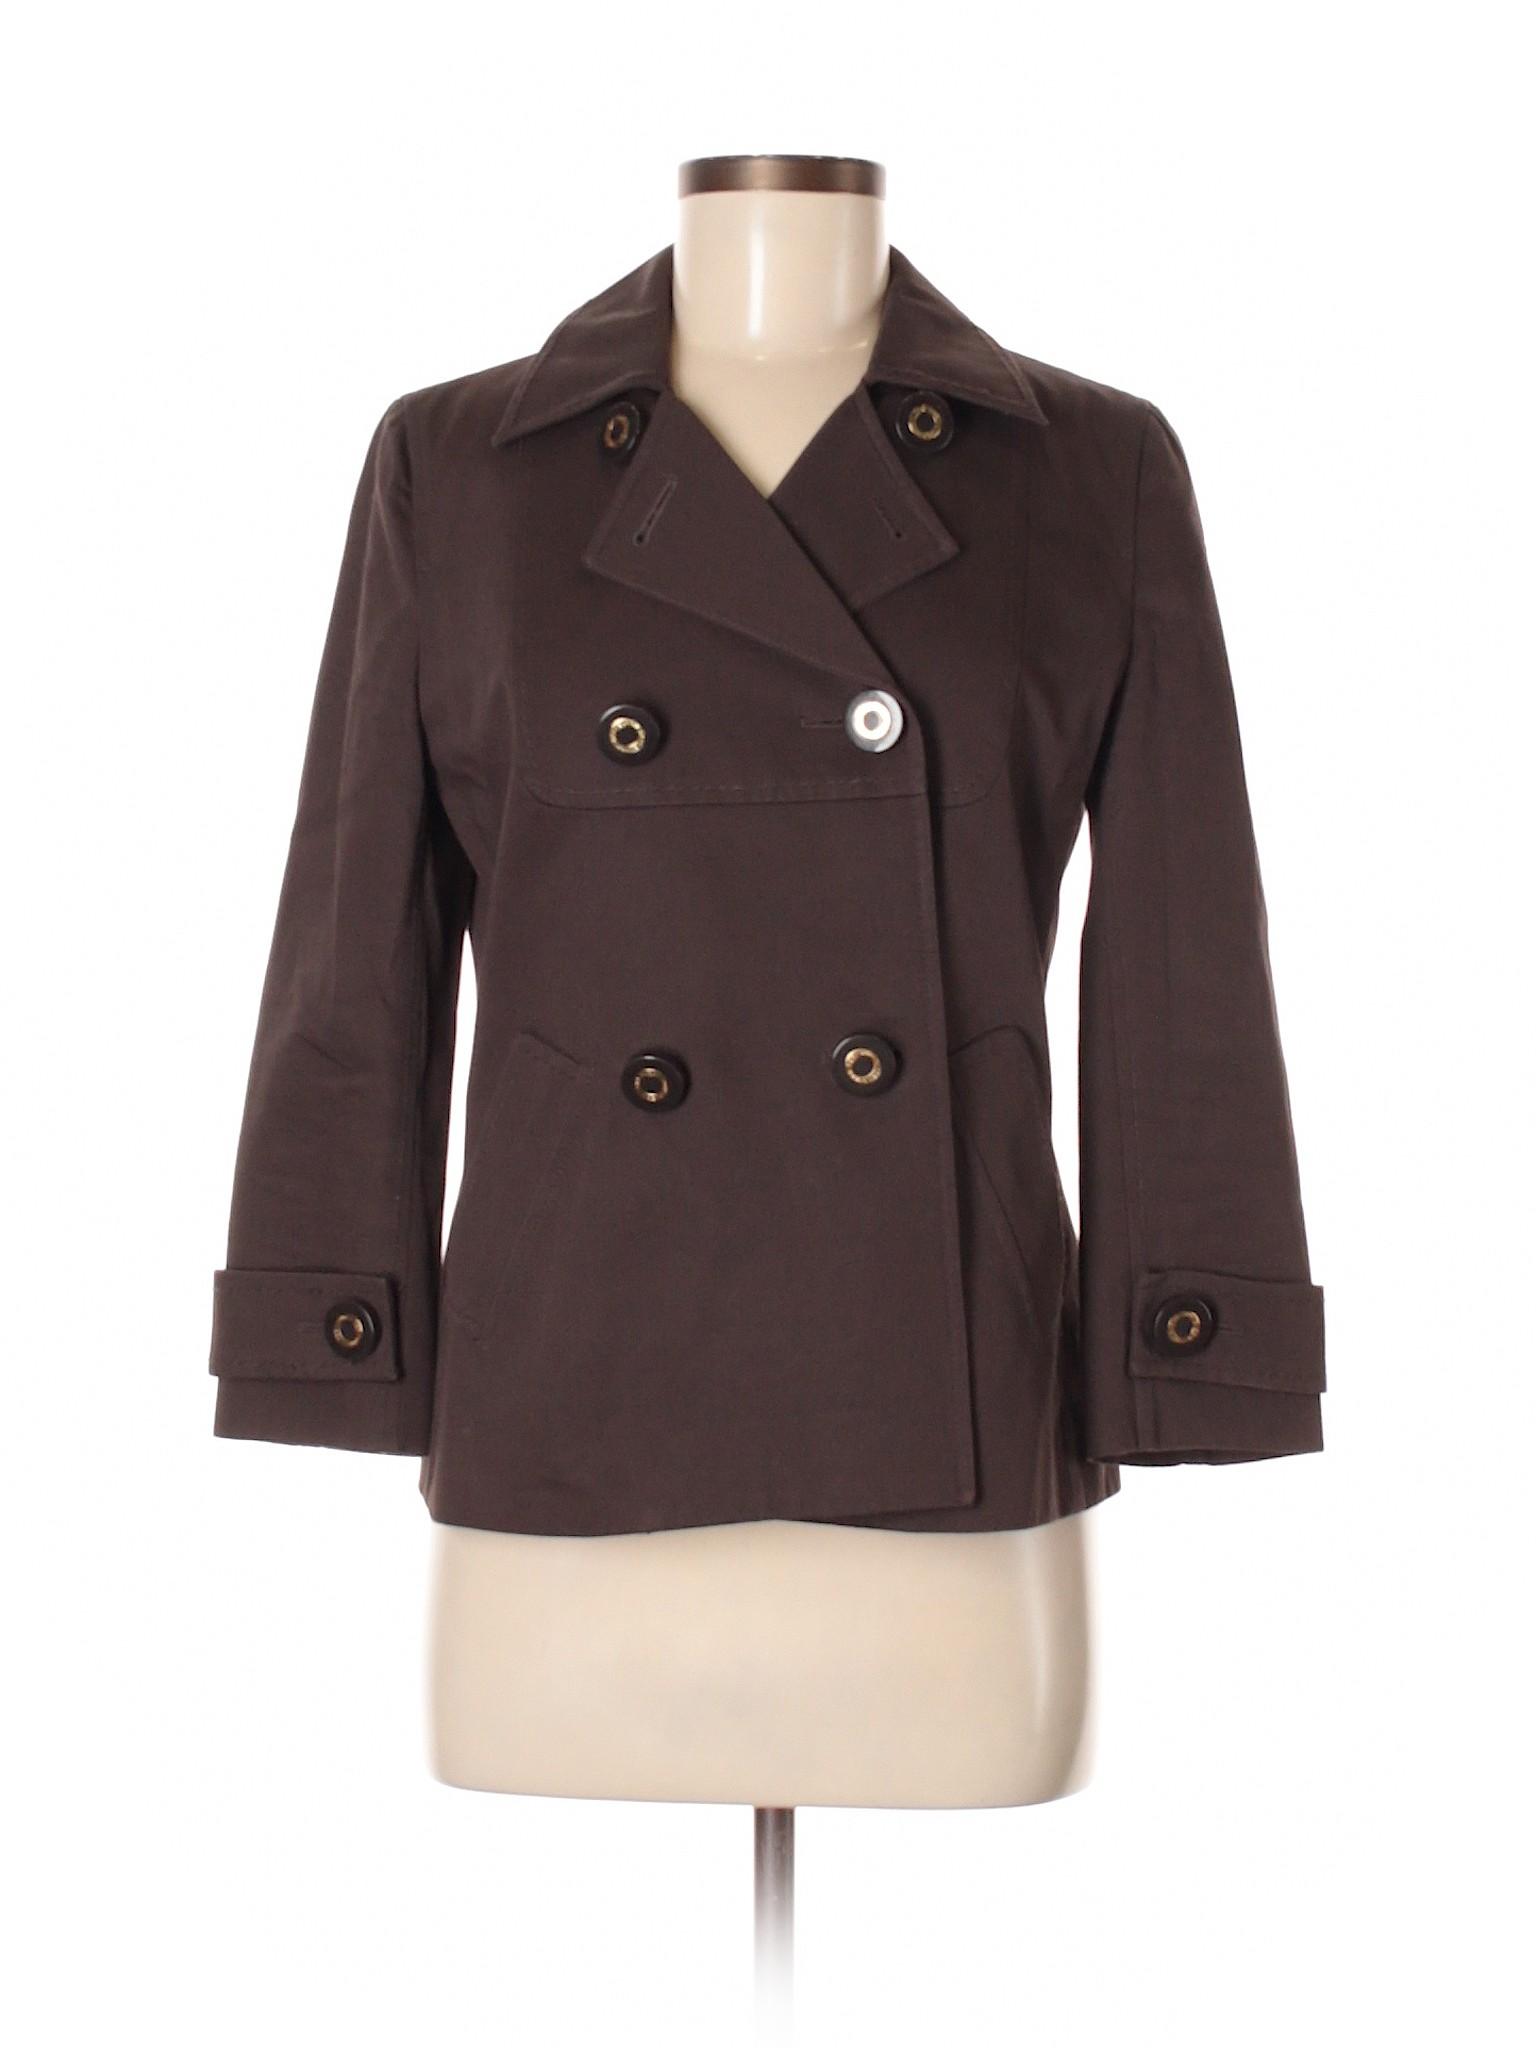 winter Tory winter Jacket Boutique Jacket Burch Burch Boutique Boutique Tory xYaqEYpU